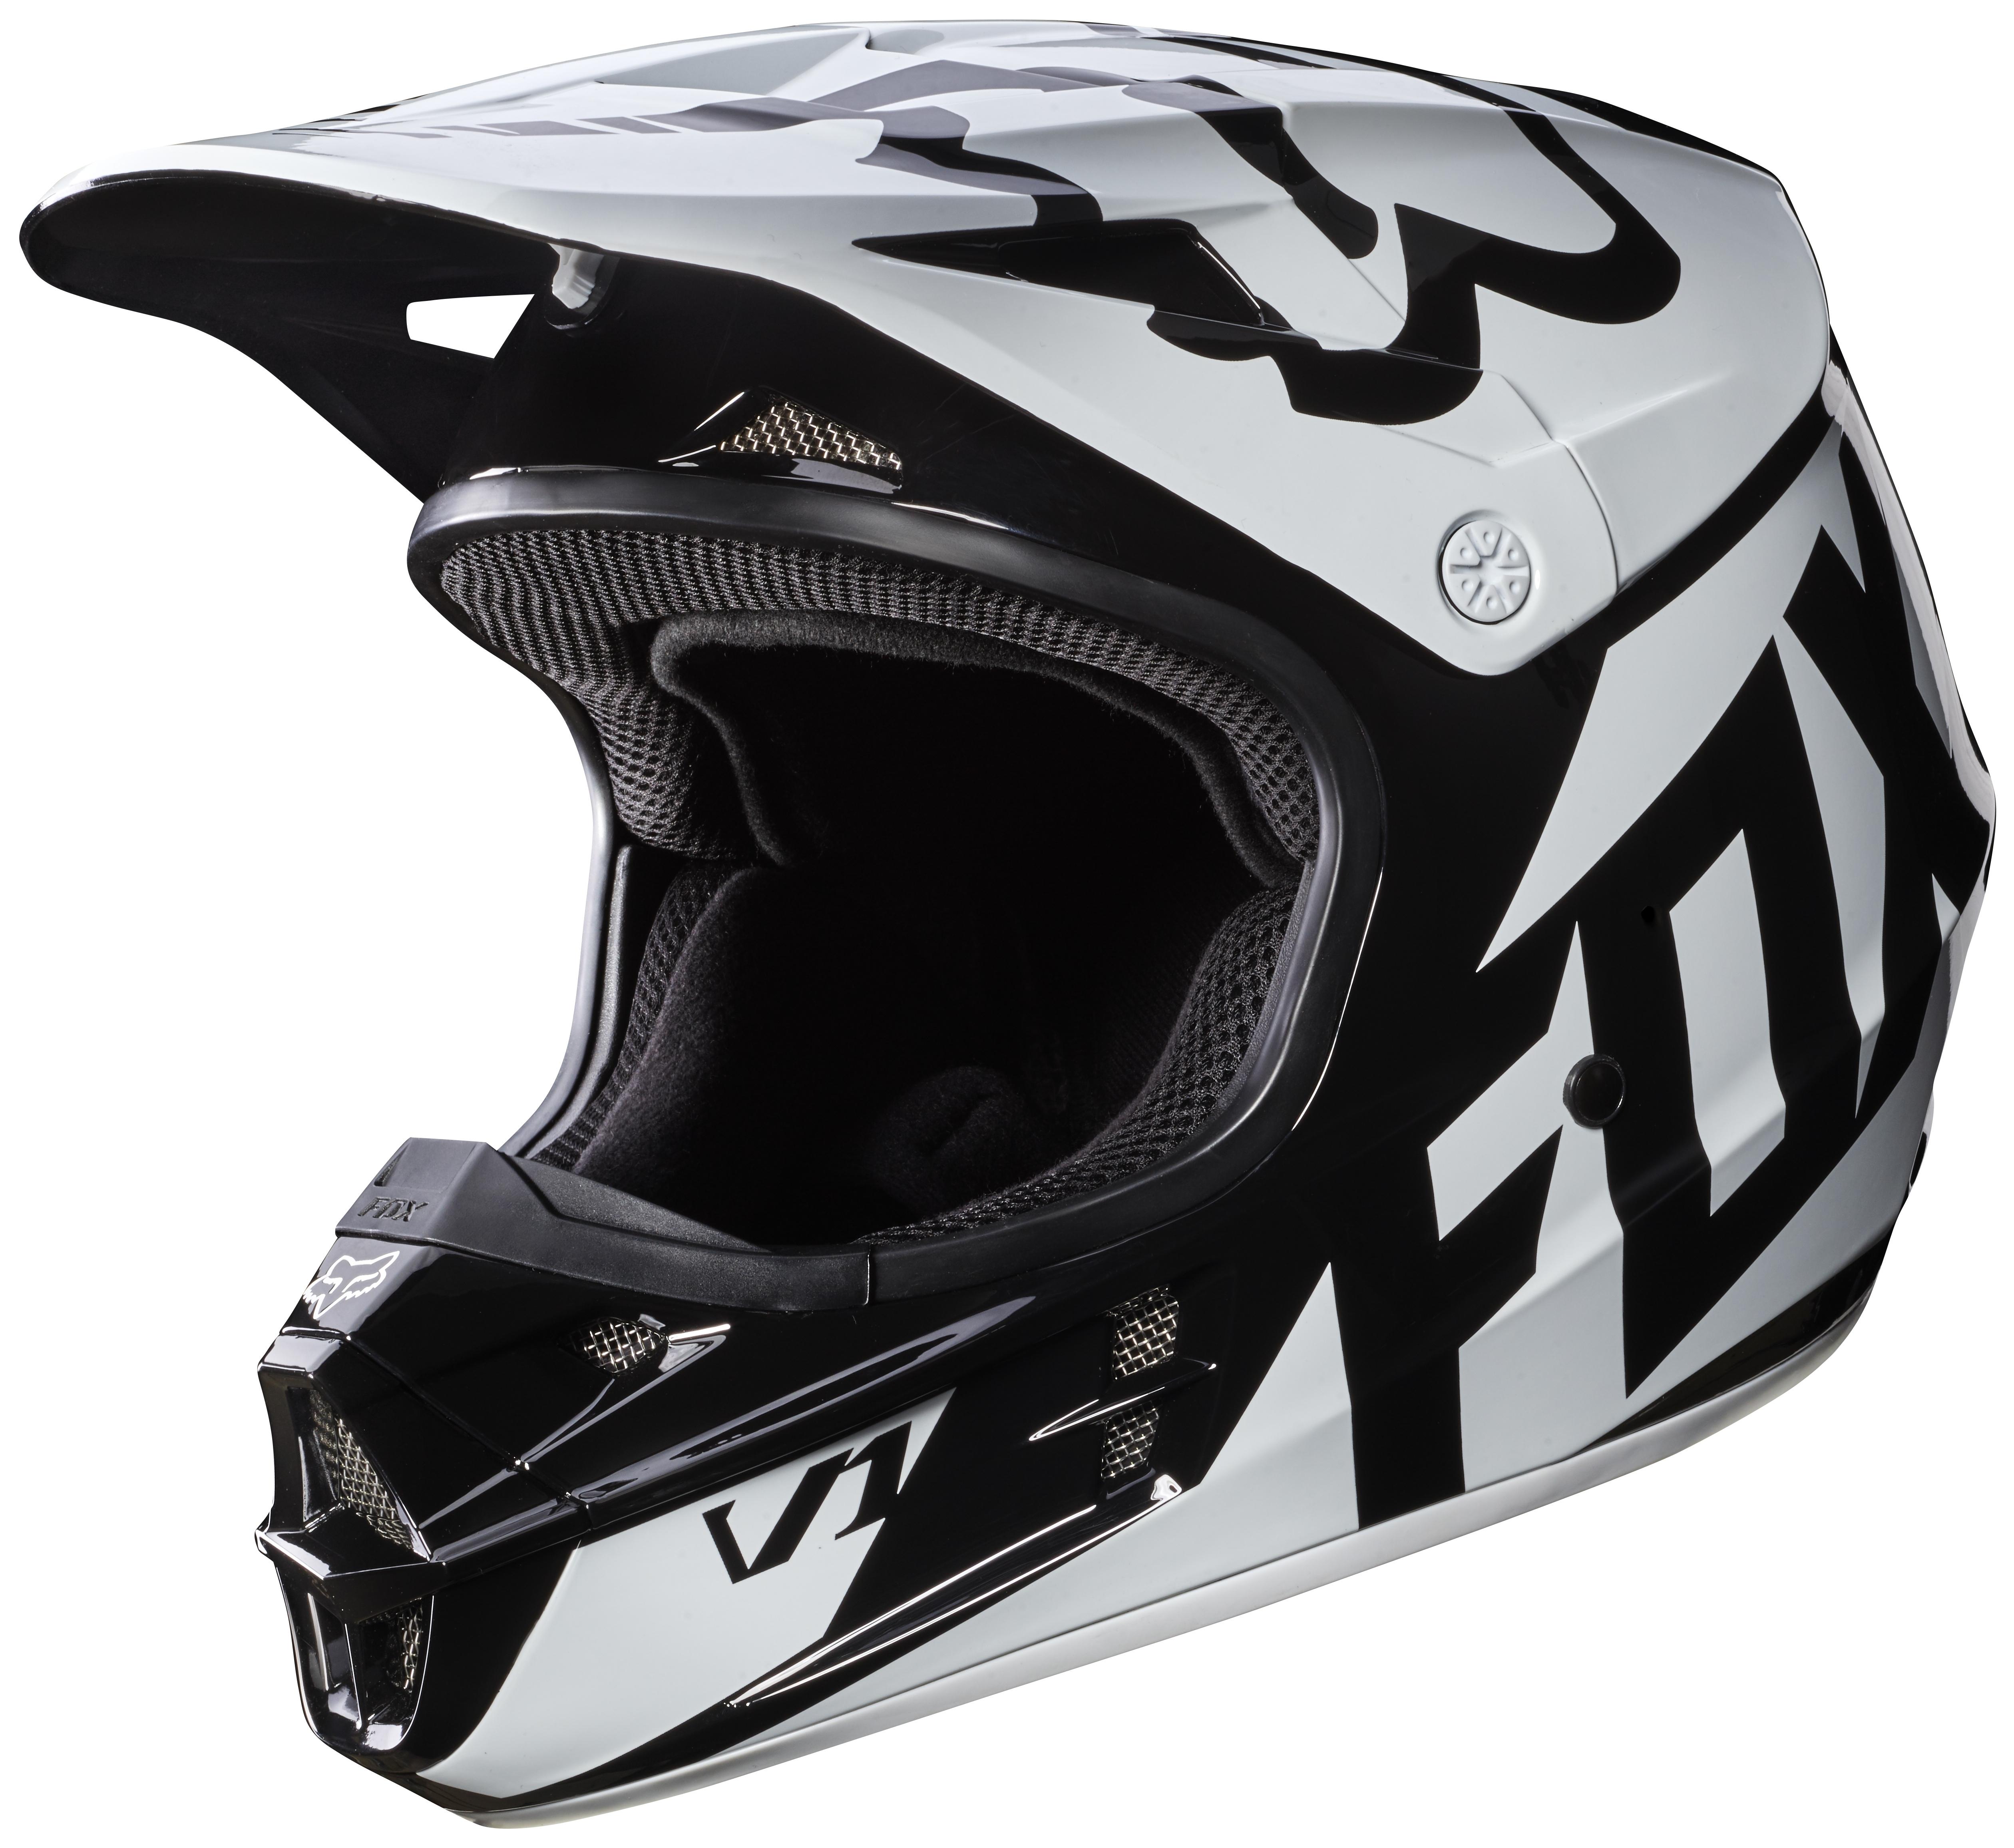 fox racing youth v1 race helmet revzilla. Black Bedroom Furniture Sets. Home Design Ideas